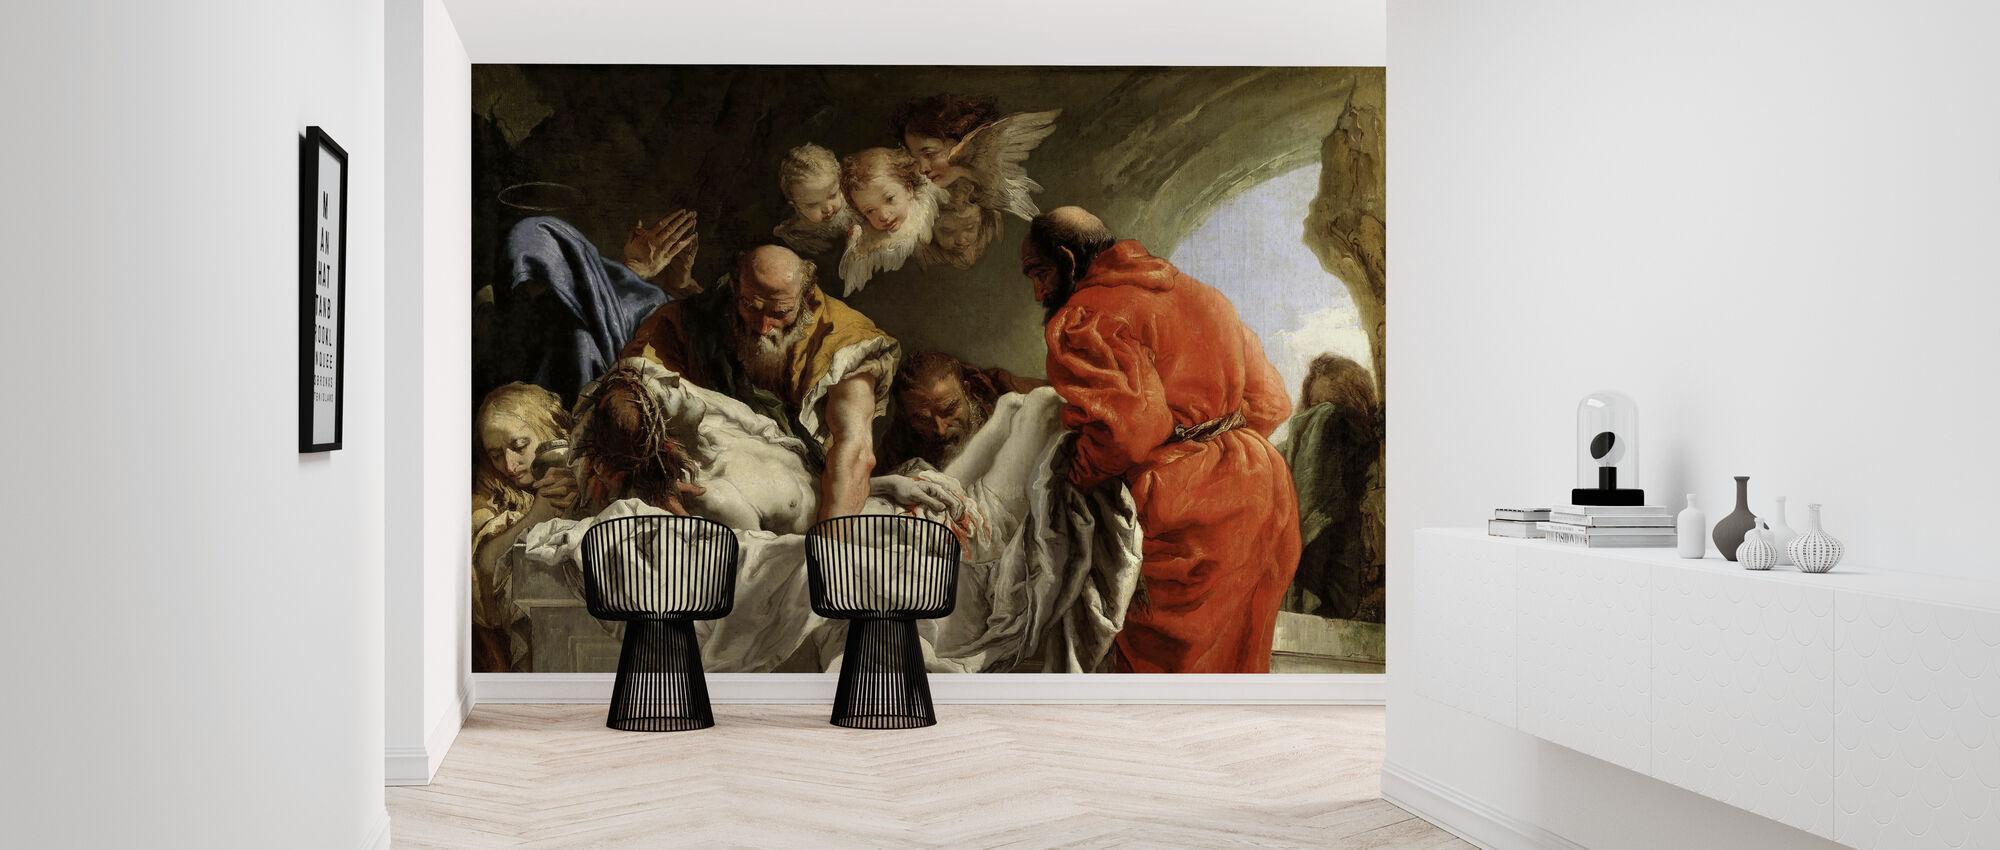 Burial of Christ - Giandomenico Tiepolo - Wallpaper - Hallway